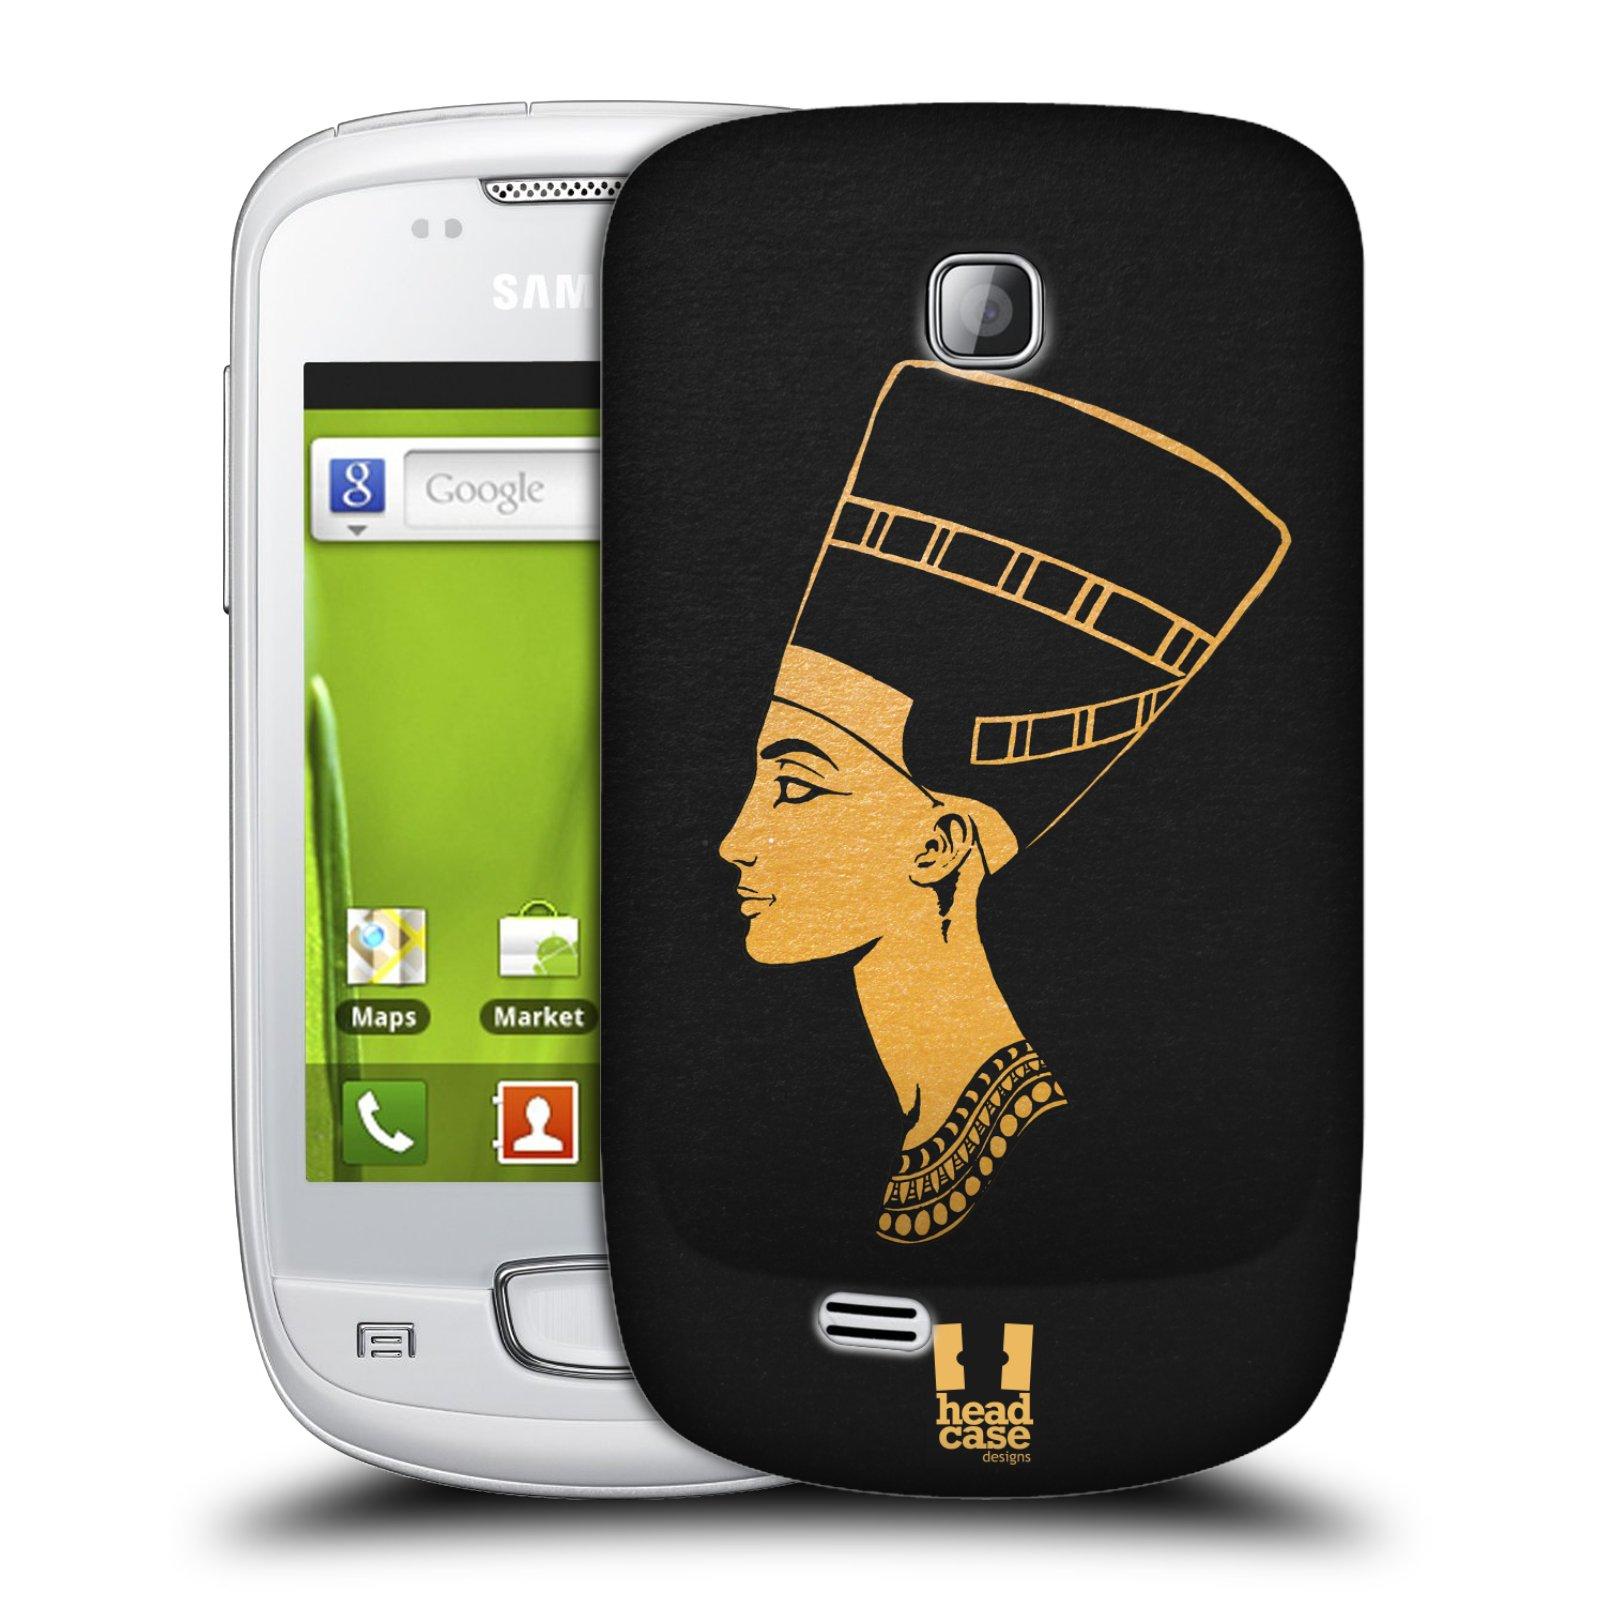 Plastové pouzdro na mobil Samsung Galaxy Mini HEAD CASE EGYPT NEFERTITI (Kryt či obal na mobilní telefon Samsung Galaxy Mini GT-S5570 / GT-S5570i)